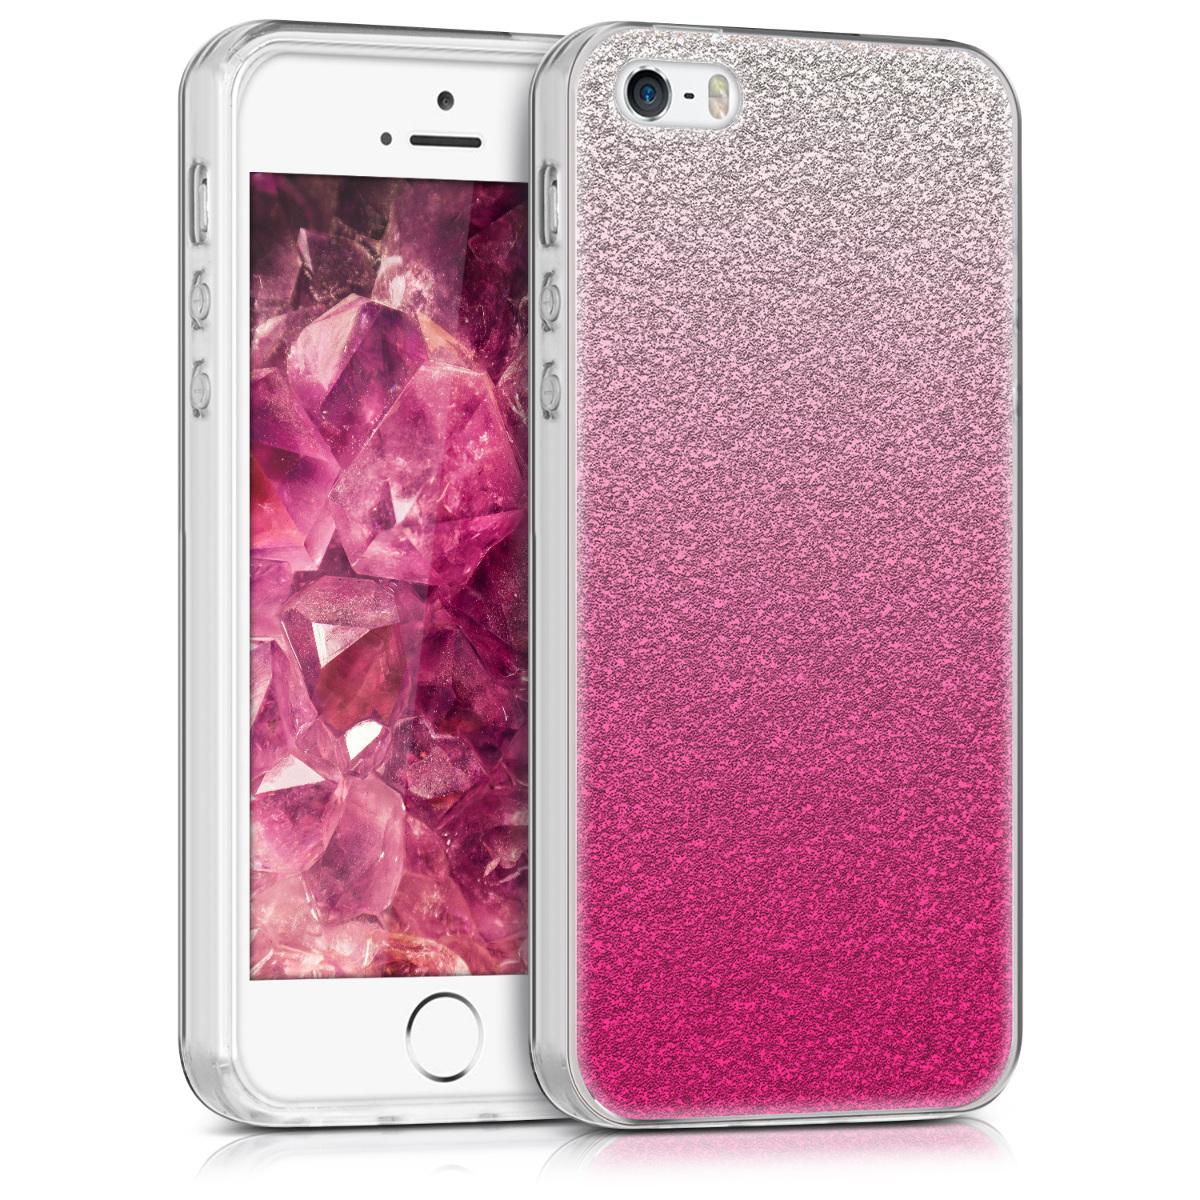 cover f r apple iphone se 5 5s h lle glitzer verlauf pink. Black Bedroom Furniture Sets. Home Design Ideas